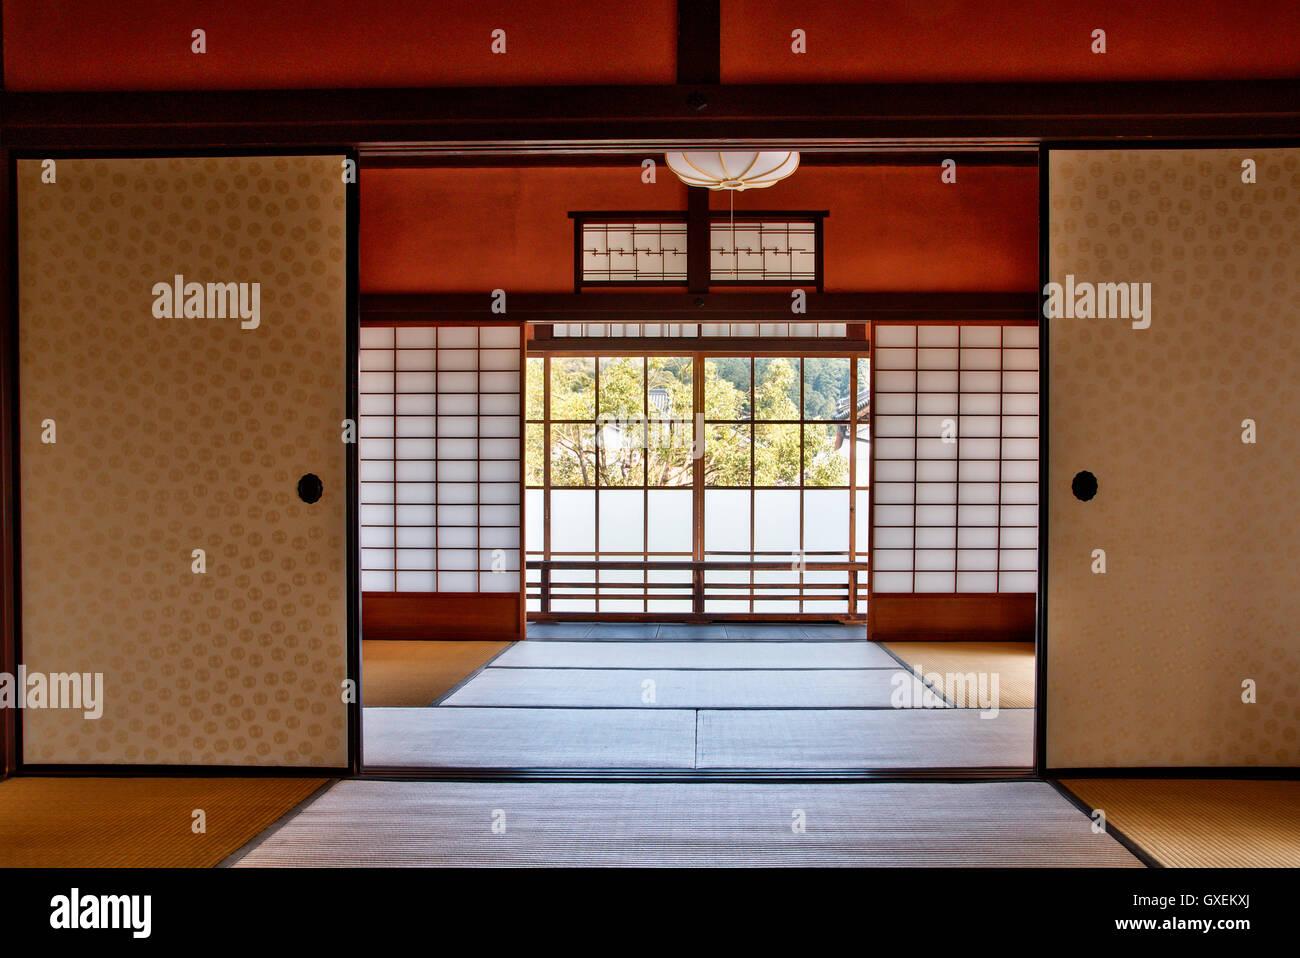 Japan, Izushi. Izushi Shiryokan museum, interior. Large Meiji period room opening onto another, then shuttered window - Stock Image